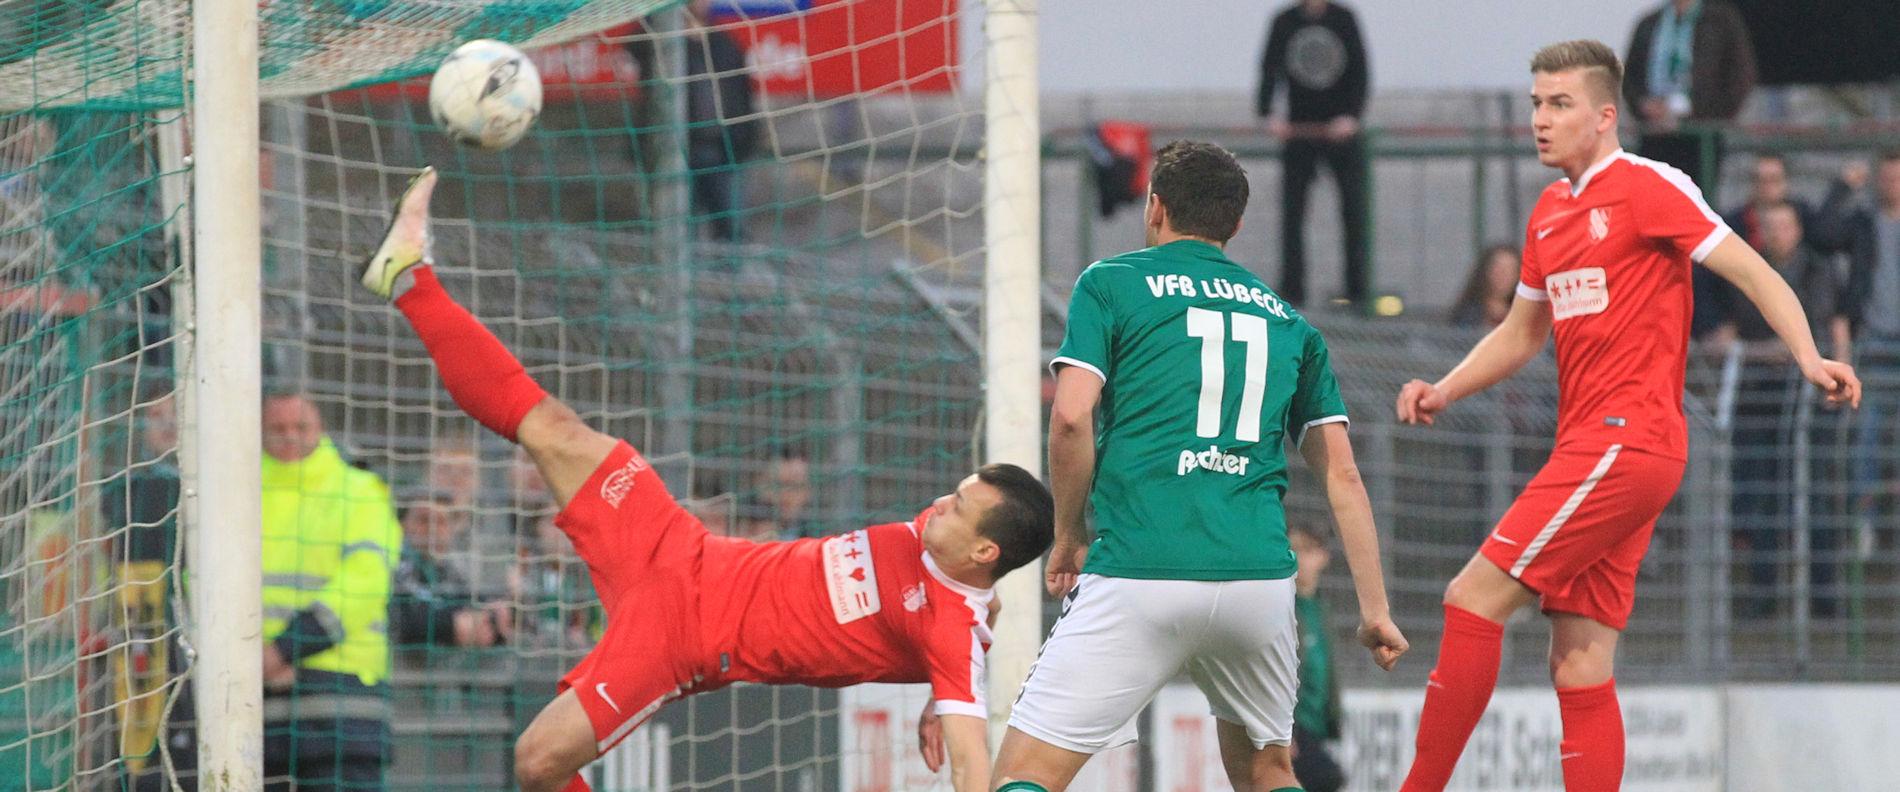 Andrej Startsev (TSV Havelse) rettet auf der Linie vor dem heranstürmenden Stefan Richter (VfB Lübeck)